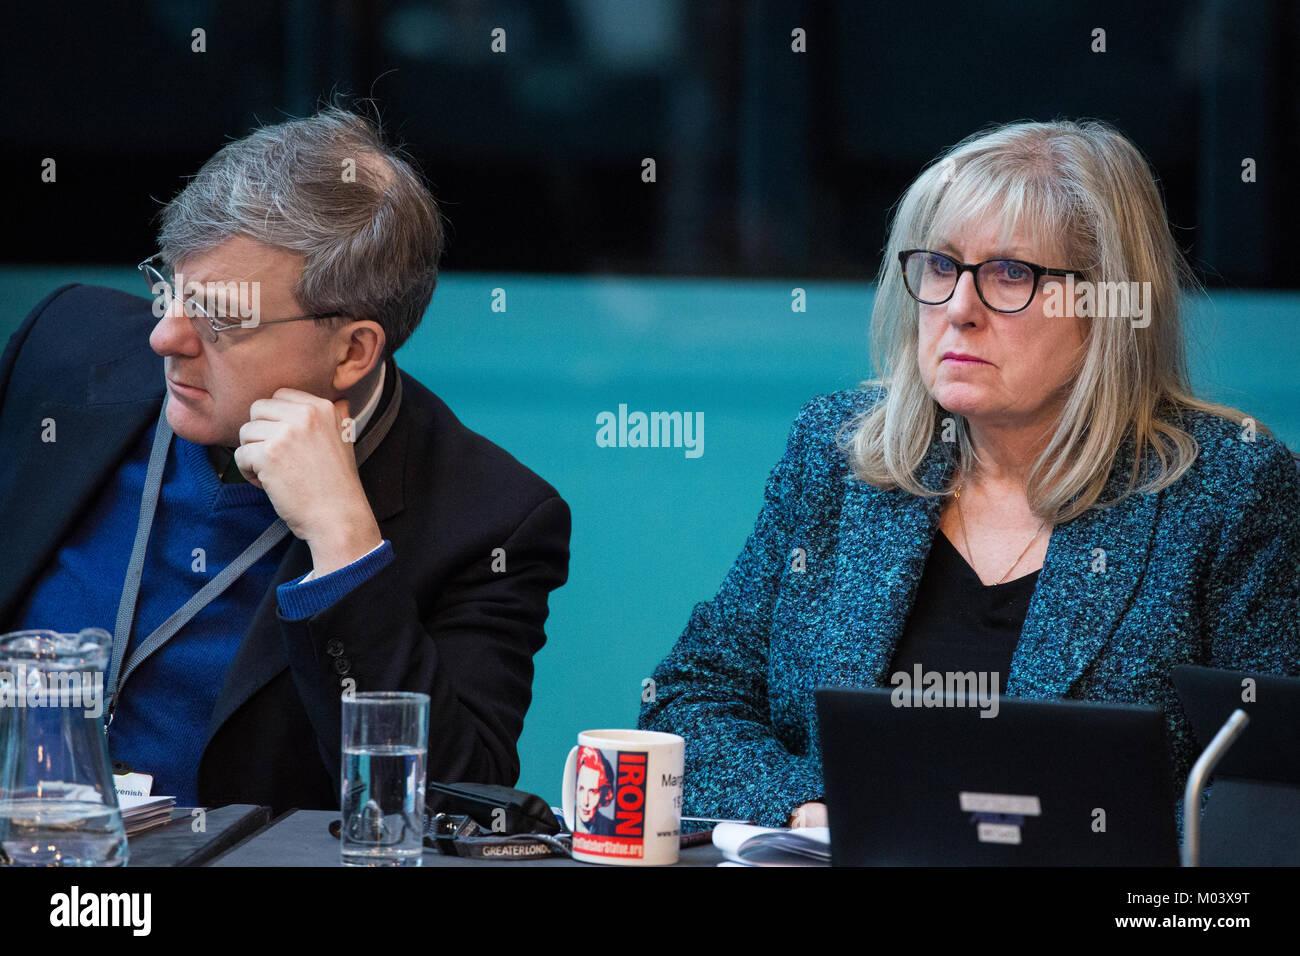 London, UK. 18th Jan, 2018. Tony Devenish and Susan Hall, Conservative London Assembly Members, listen to Mayor - Stock Image